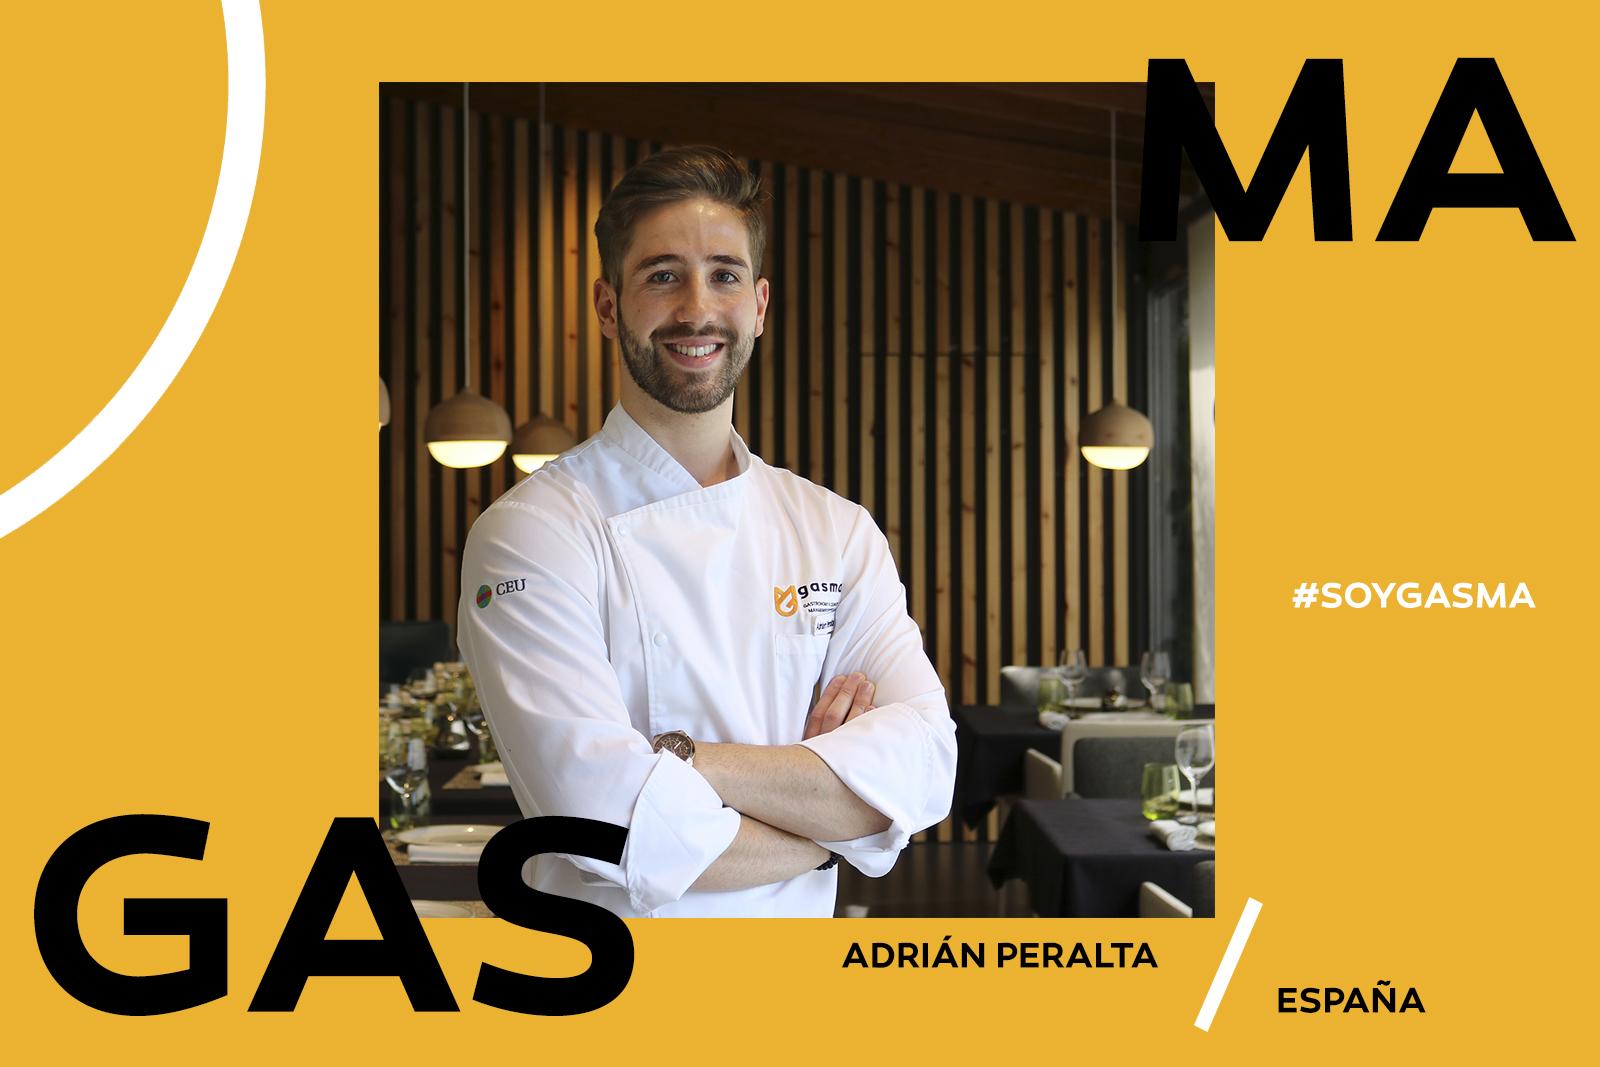 Adrián Peralta alumni Gasma